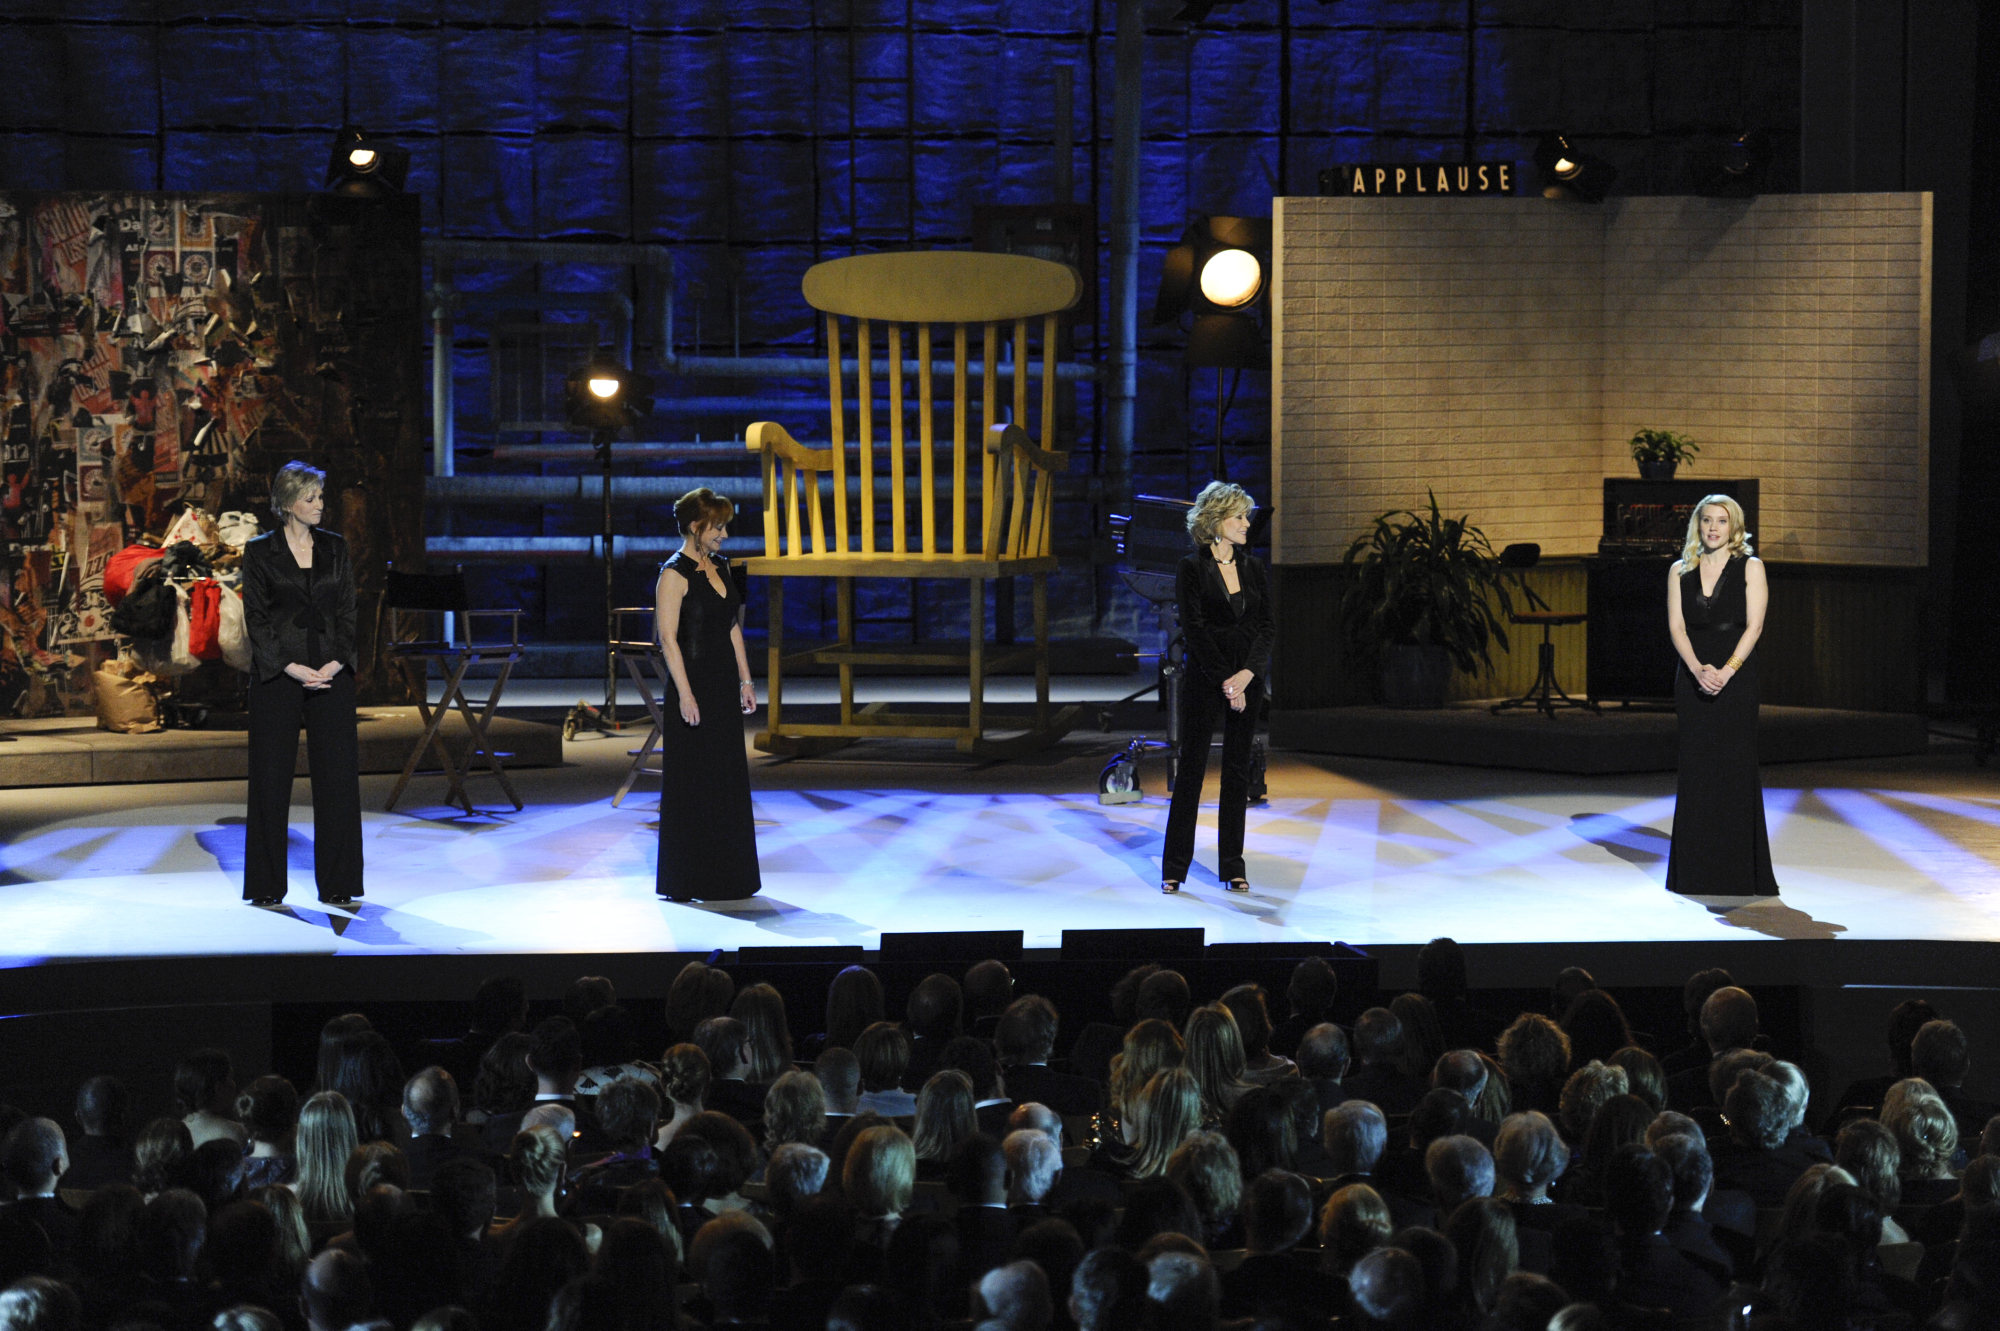 Jane Lynch, Reba McEntire, Jane Fonda, and Kate McKinnon Share the Stage